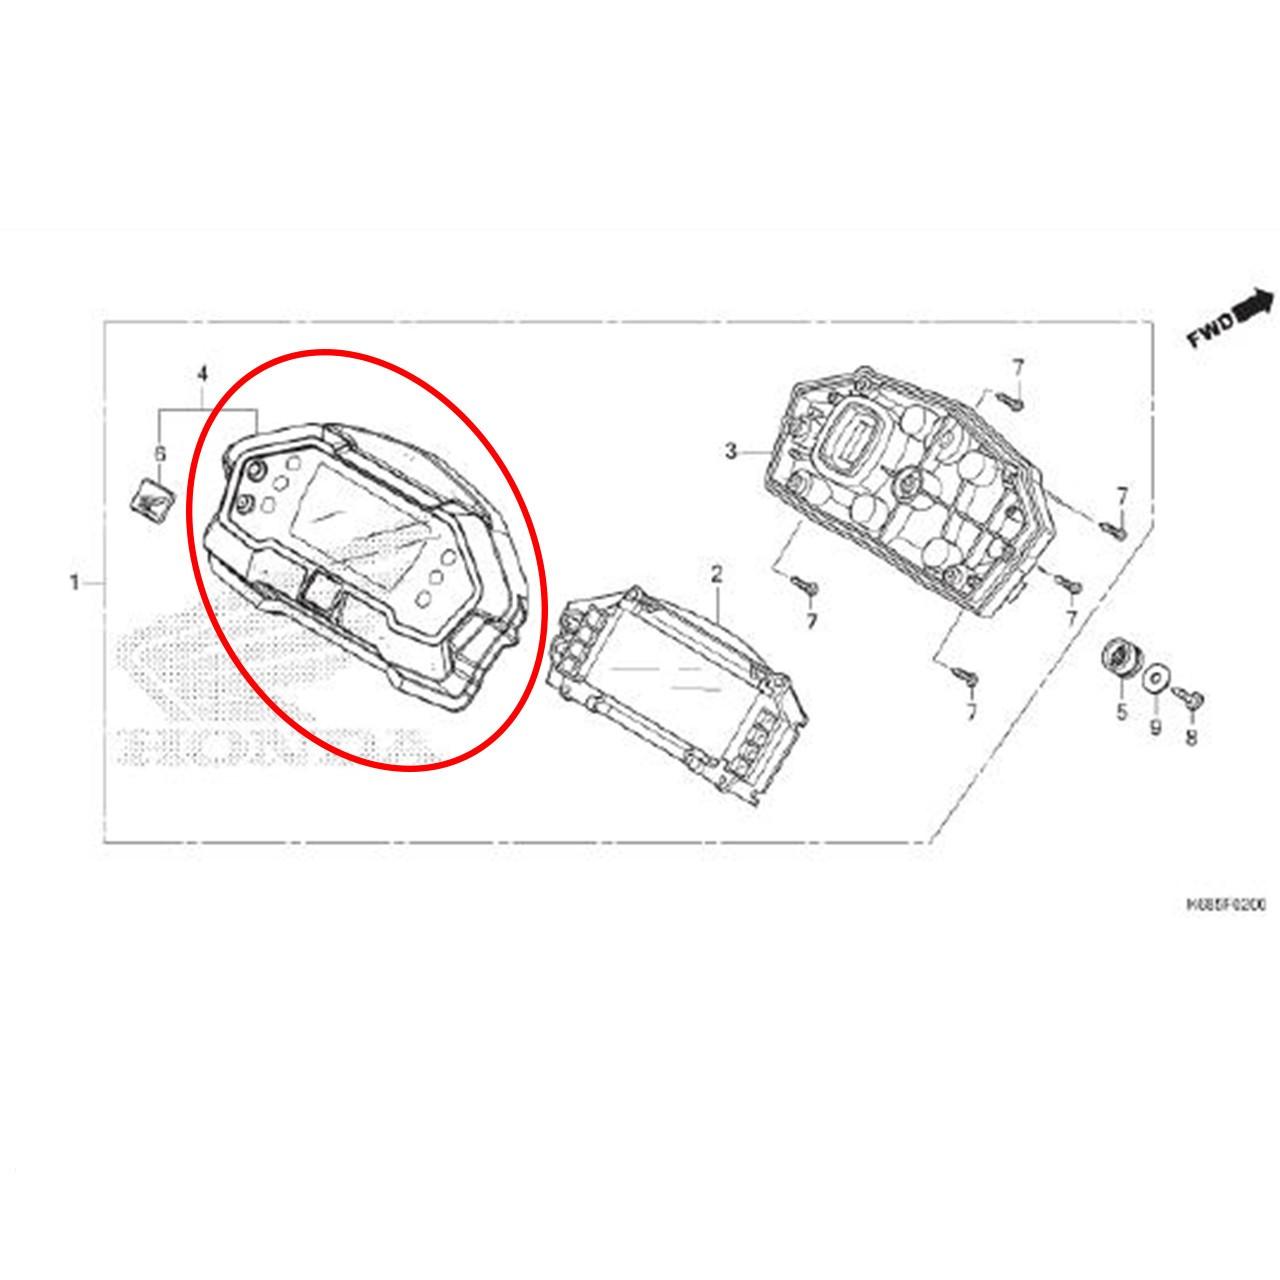 Carcaça Superior Painel XRE 190 2016 2017 2018 2019 Original Honda 37125K68900